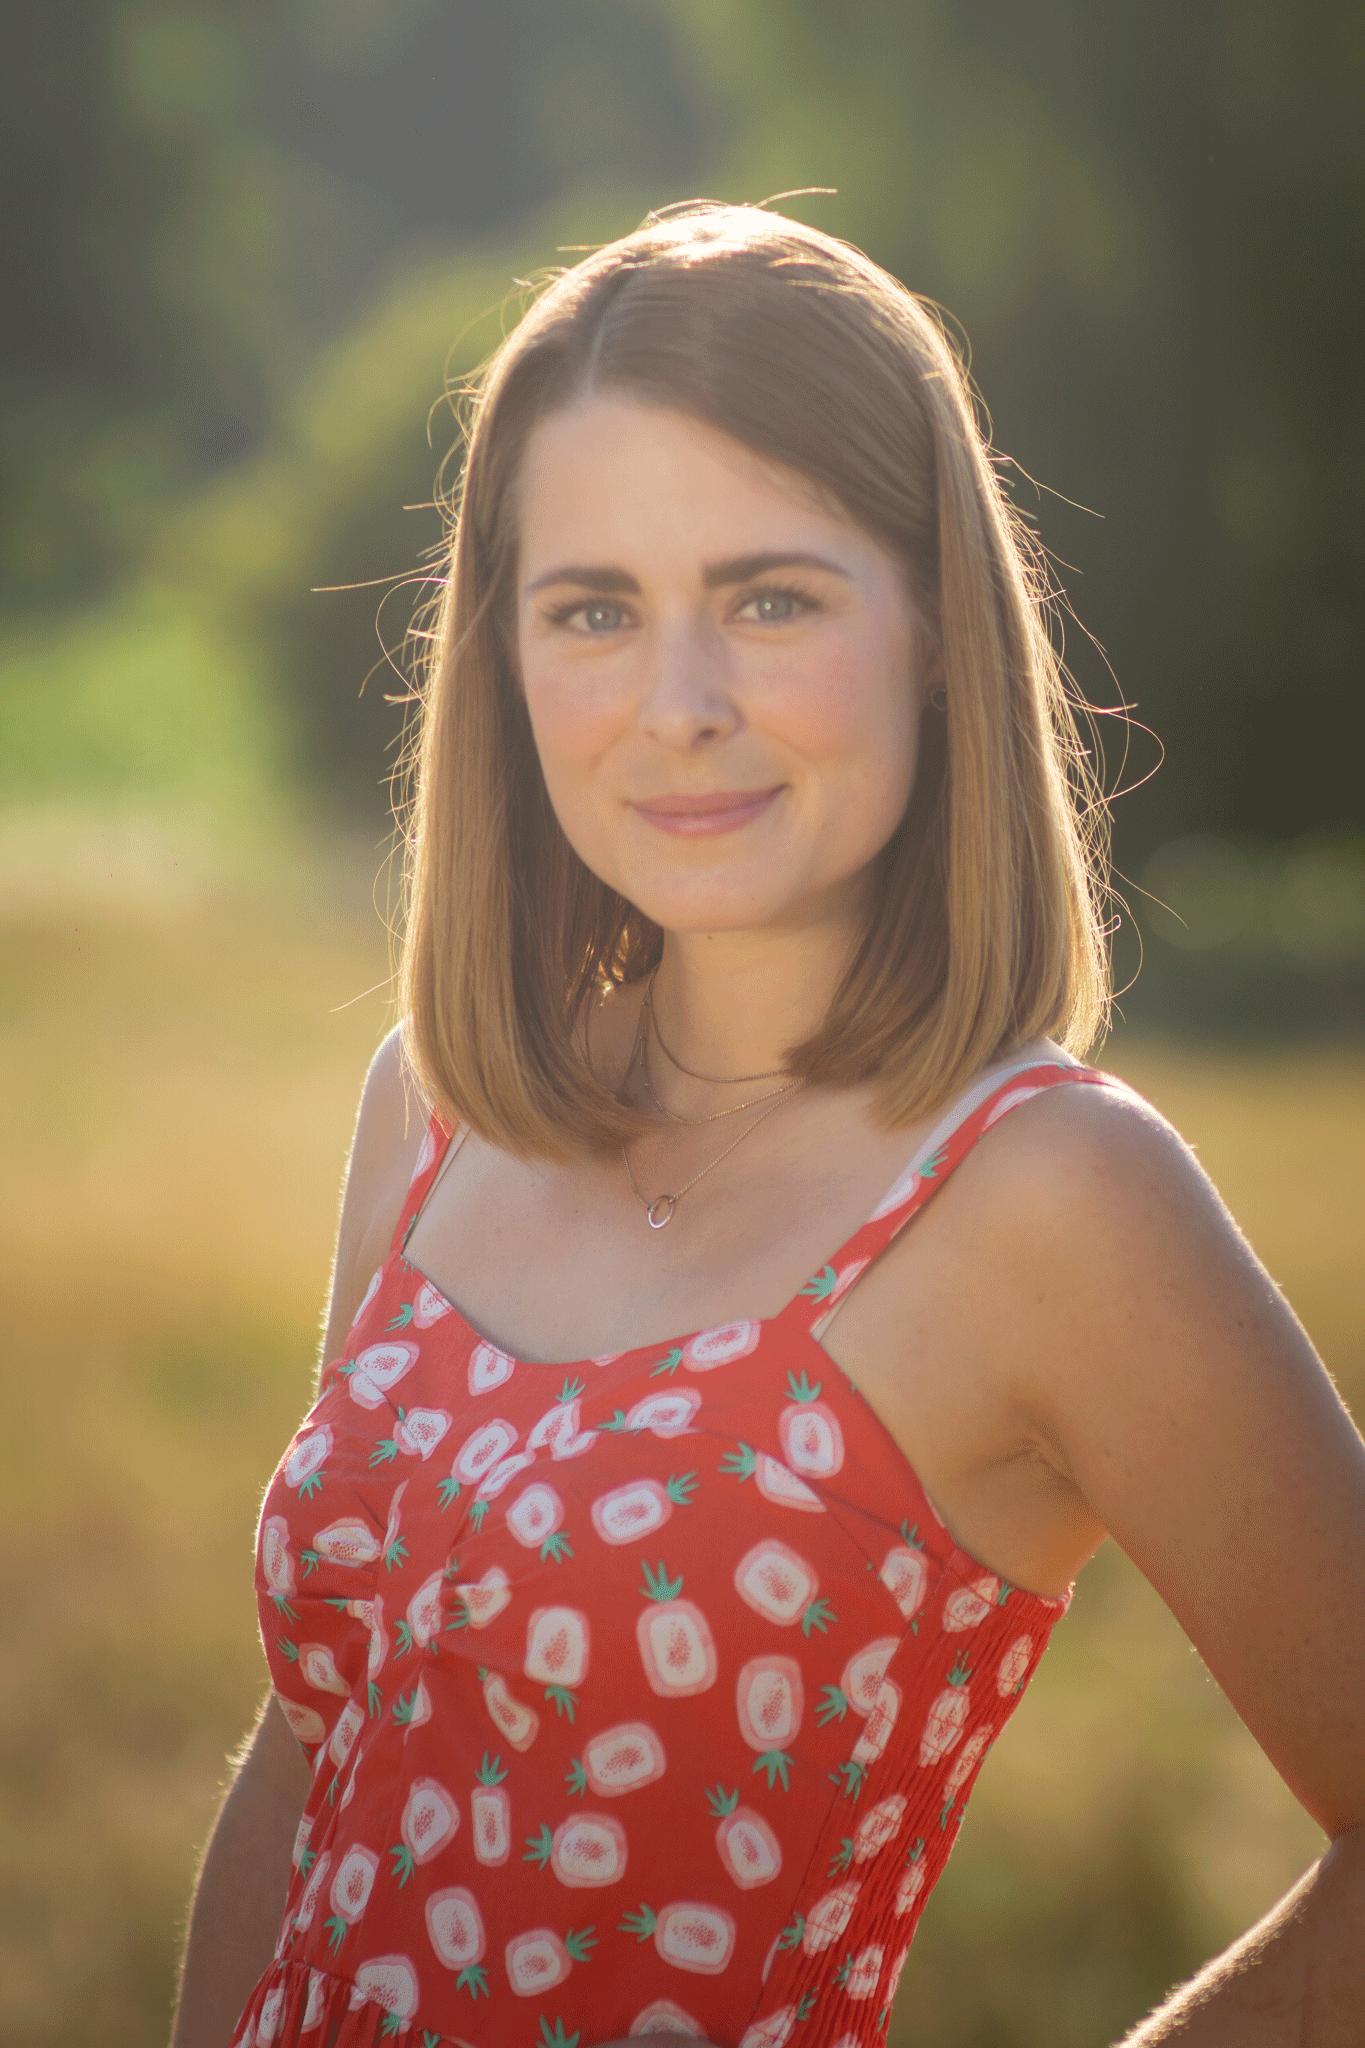 Fruchtiges Sommeroutfit: Midi - Kleid mit Ananas - Print